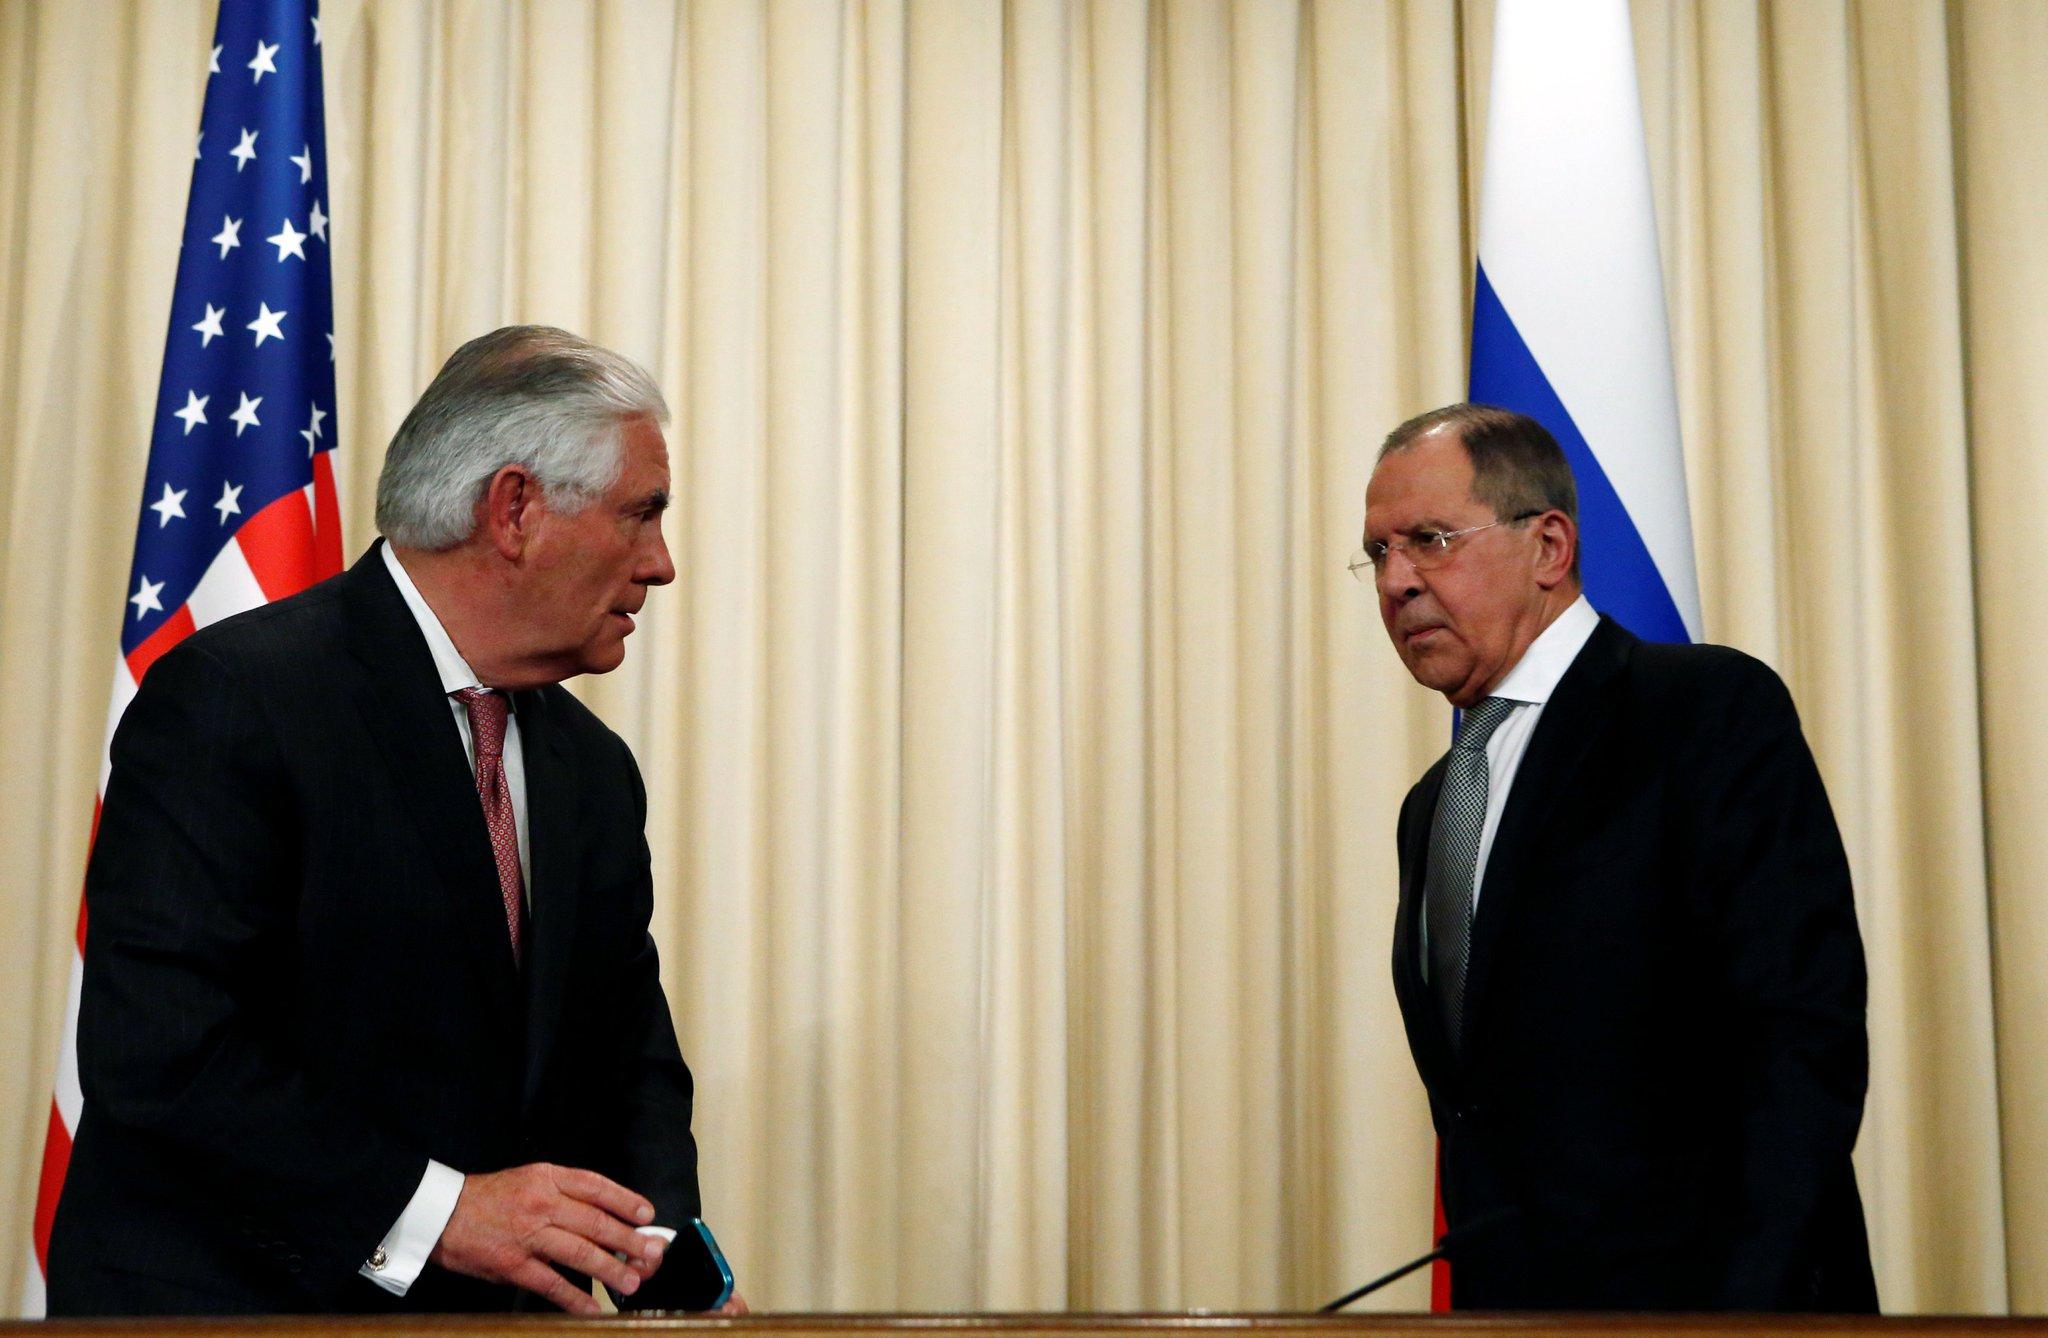 Лавров и трамп встреча фото